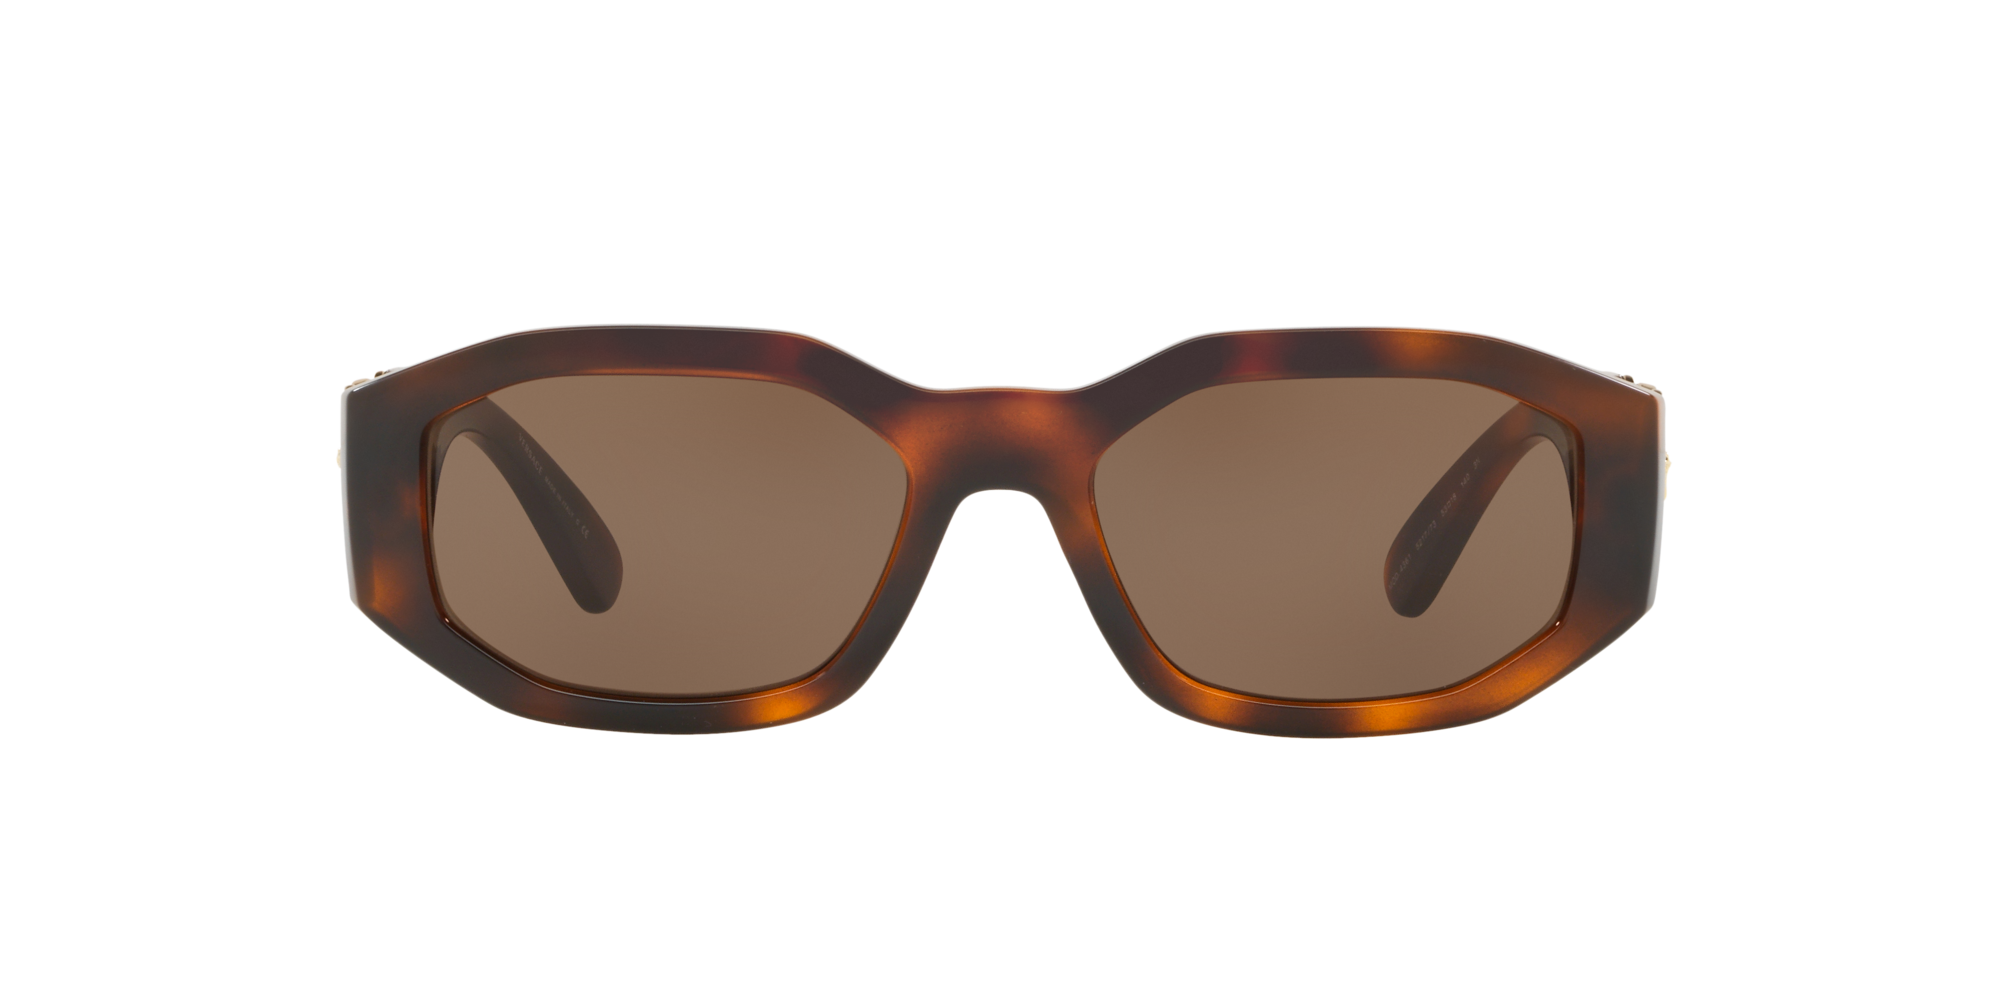 Image for VE4361 53 from LensCrafters | Glasses, Prescription Glasses Online, Eyewear